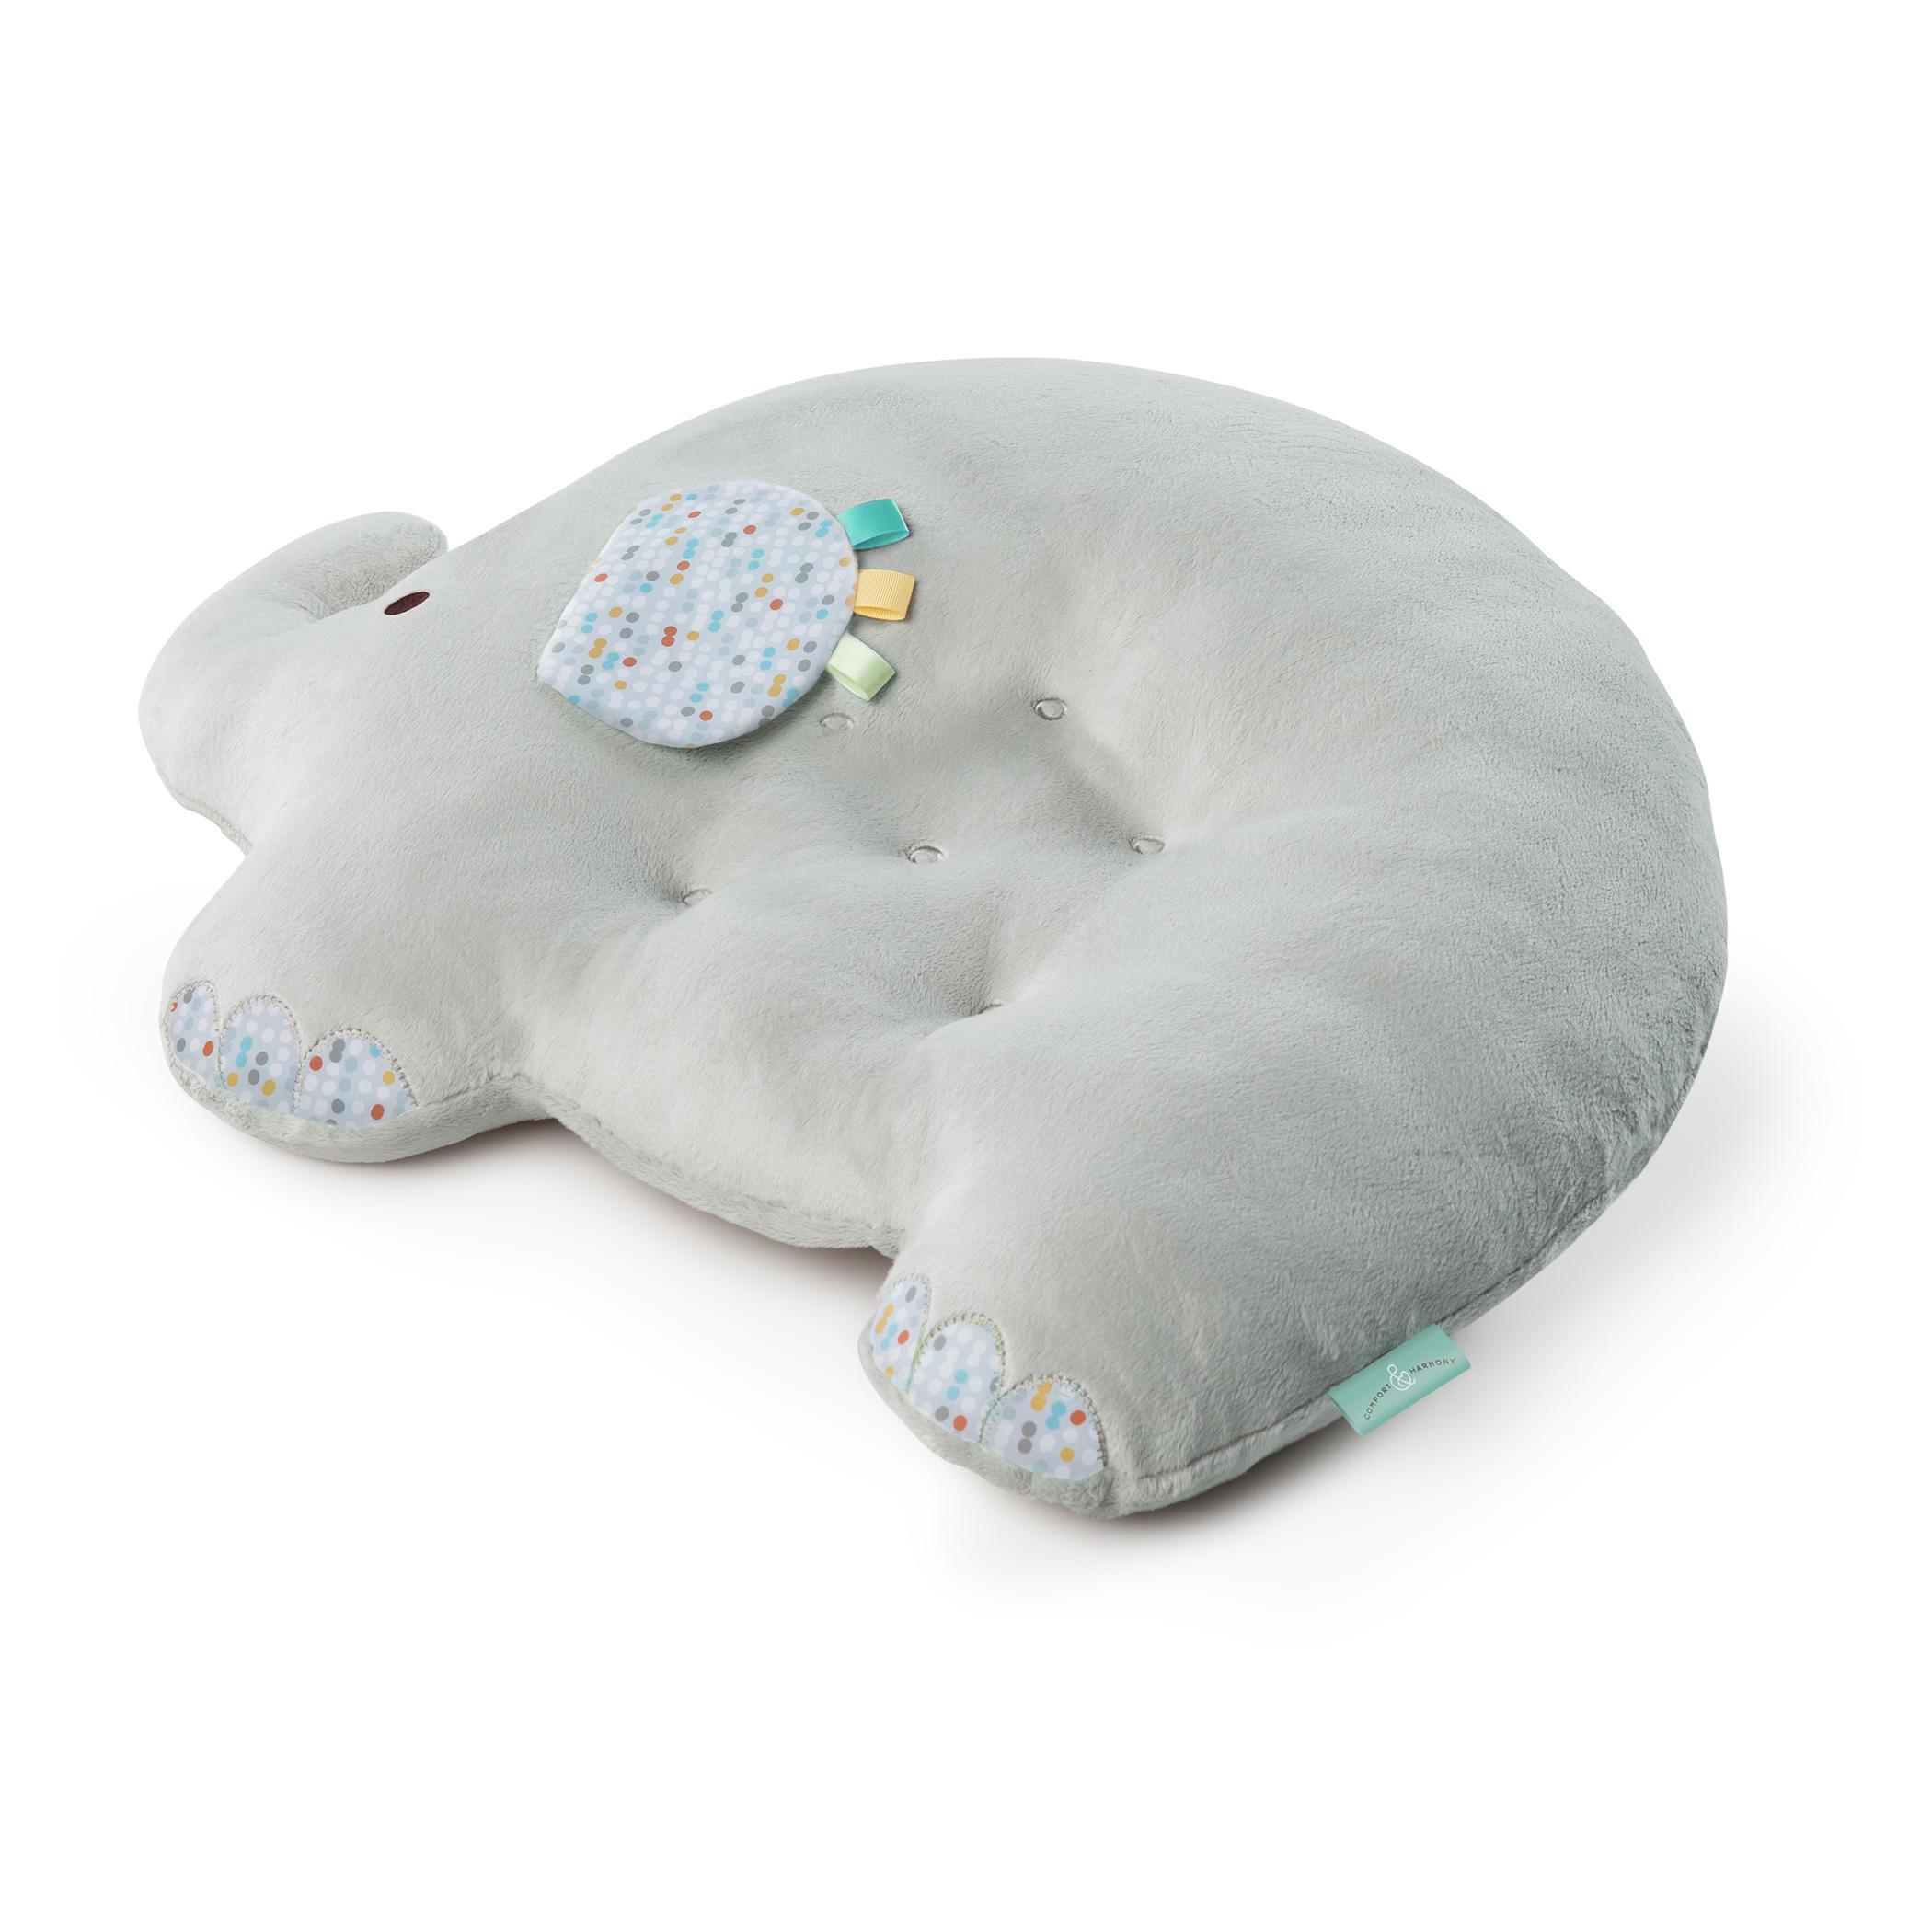 LoungeBuddies Infant Positioner™ - Elephant